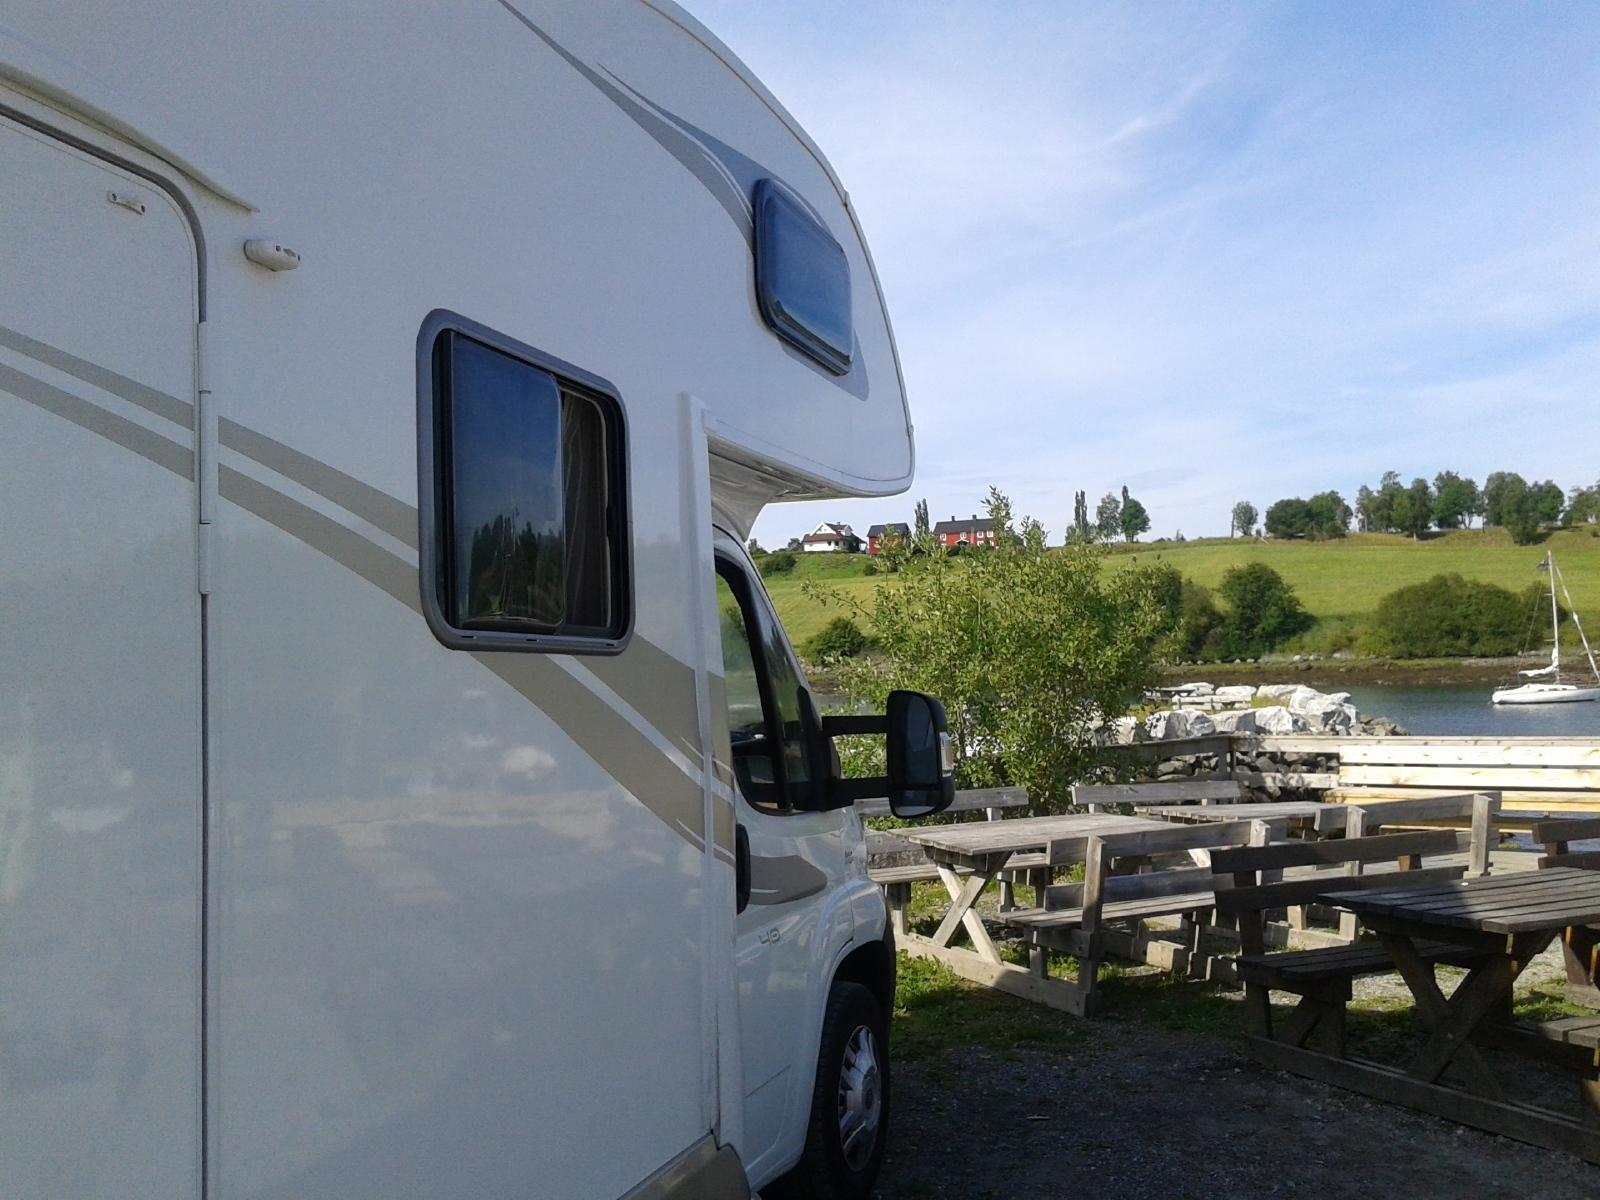 nos camping cars de location cambrai nord pas de calais. Black Bedroom Furniture Sets. Home Design Ideas